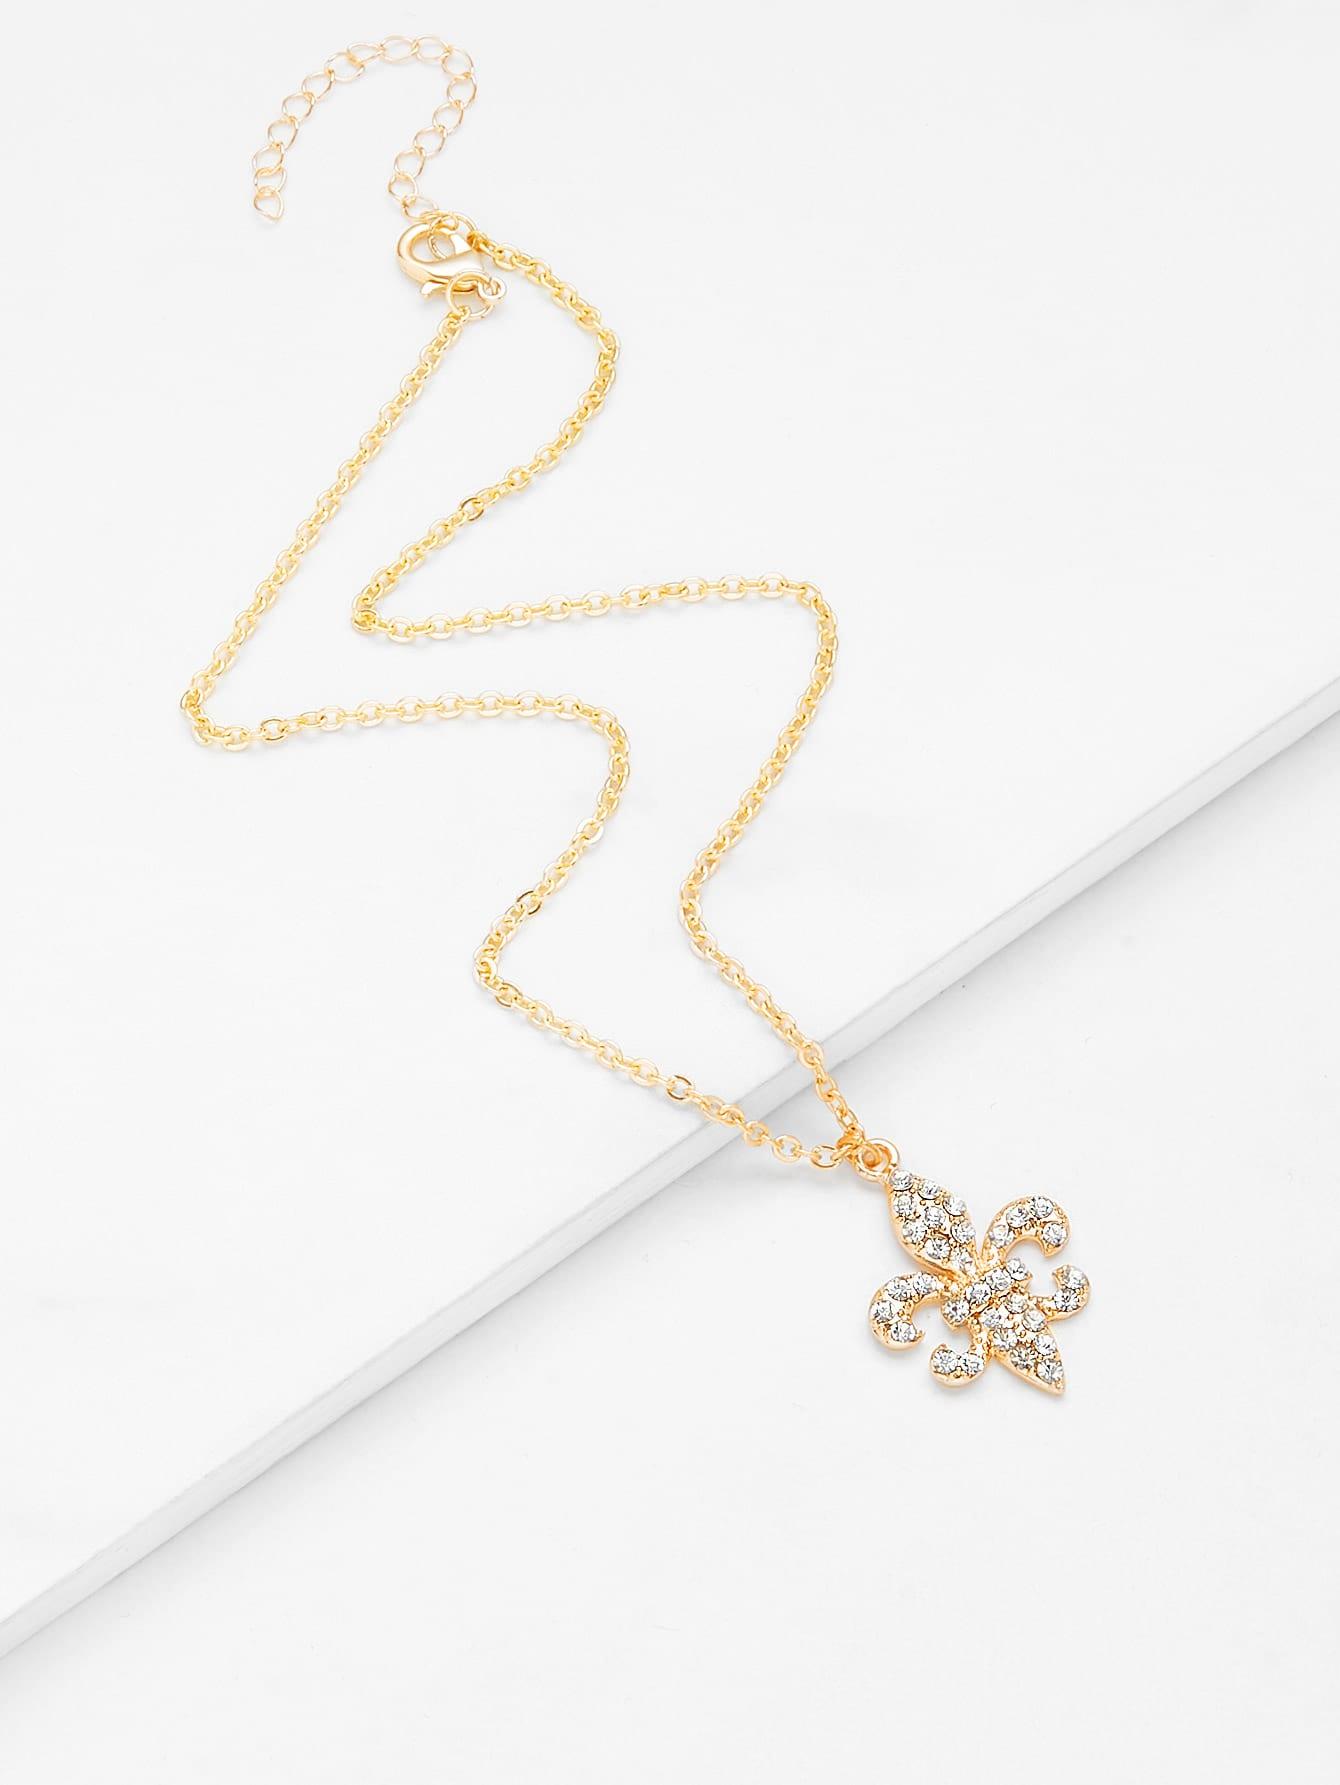 Rhinestone Detail Pendant Design Chain Necklace